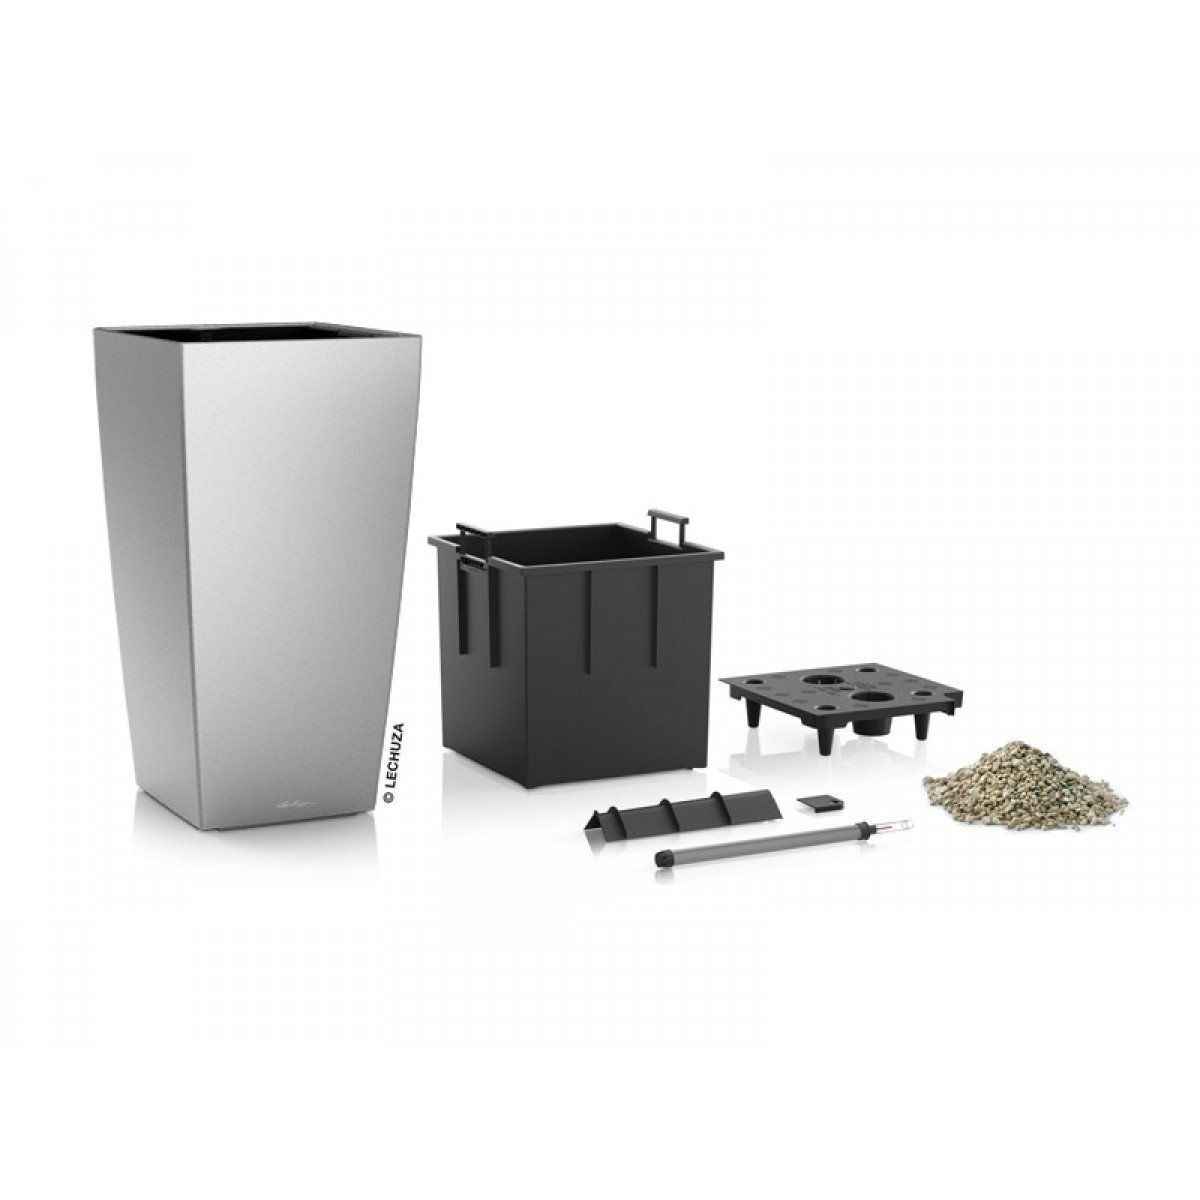 Lechuza EP-LALT-SIL-16 16 x 16 x 41 in. Cubico Alto Premium Planter44; Silver Metallic